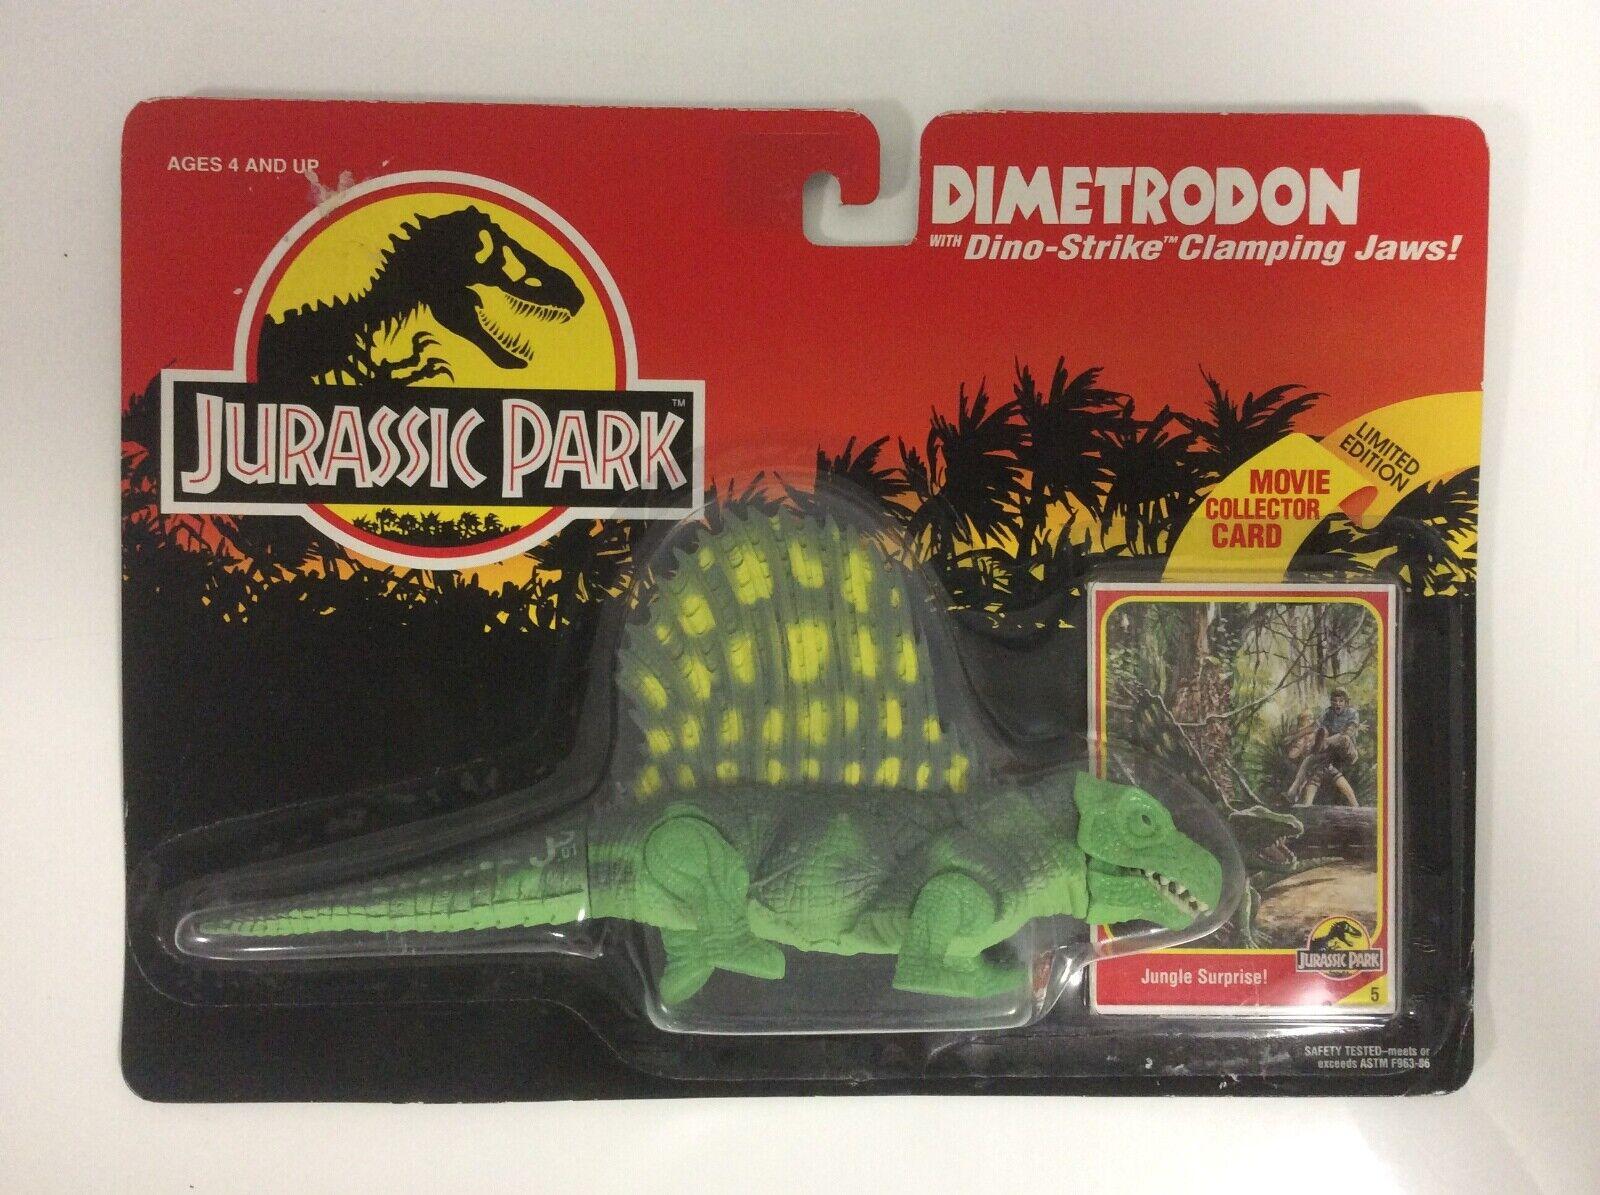 1993 Kenner Jurassic Park Dinosauri Figur - Dimetrodon - MOSC